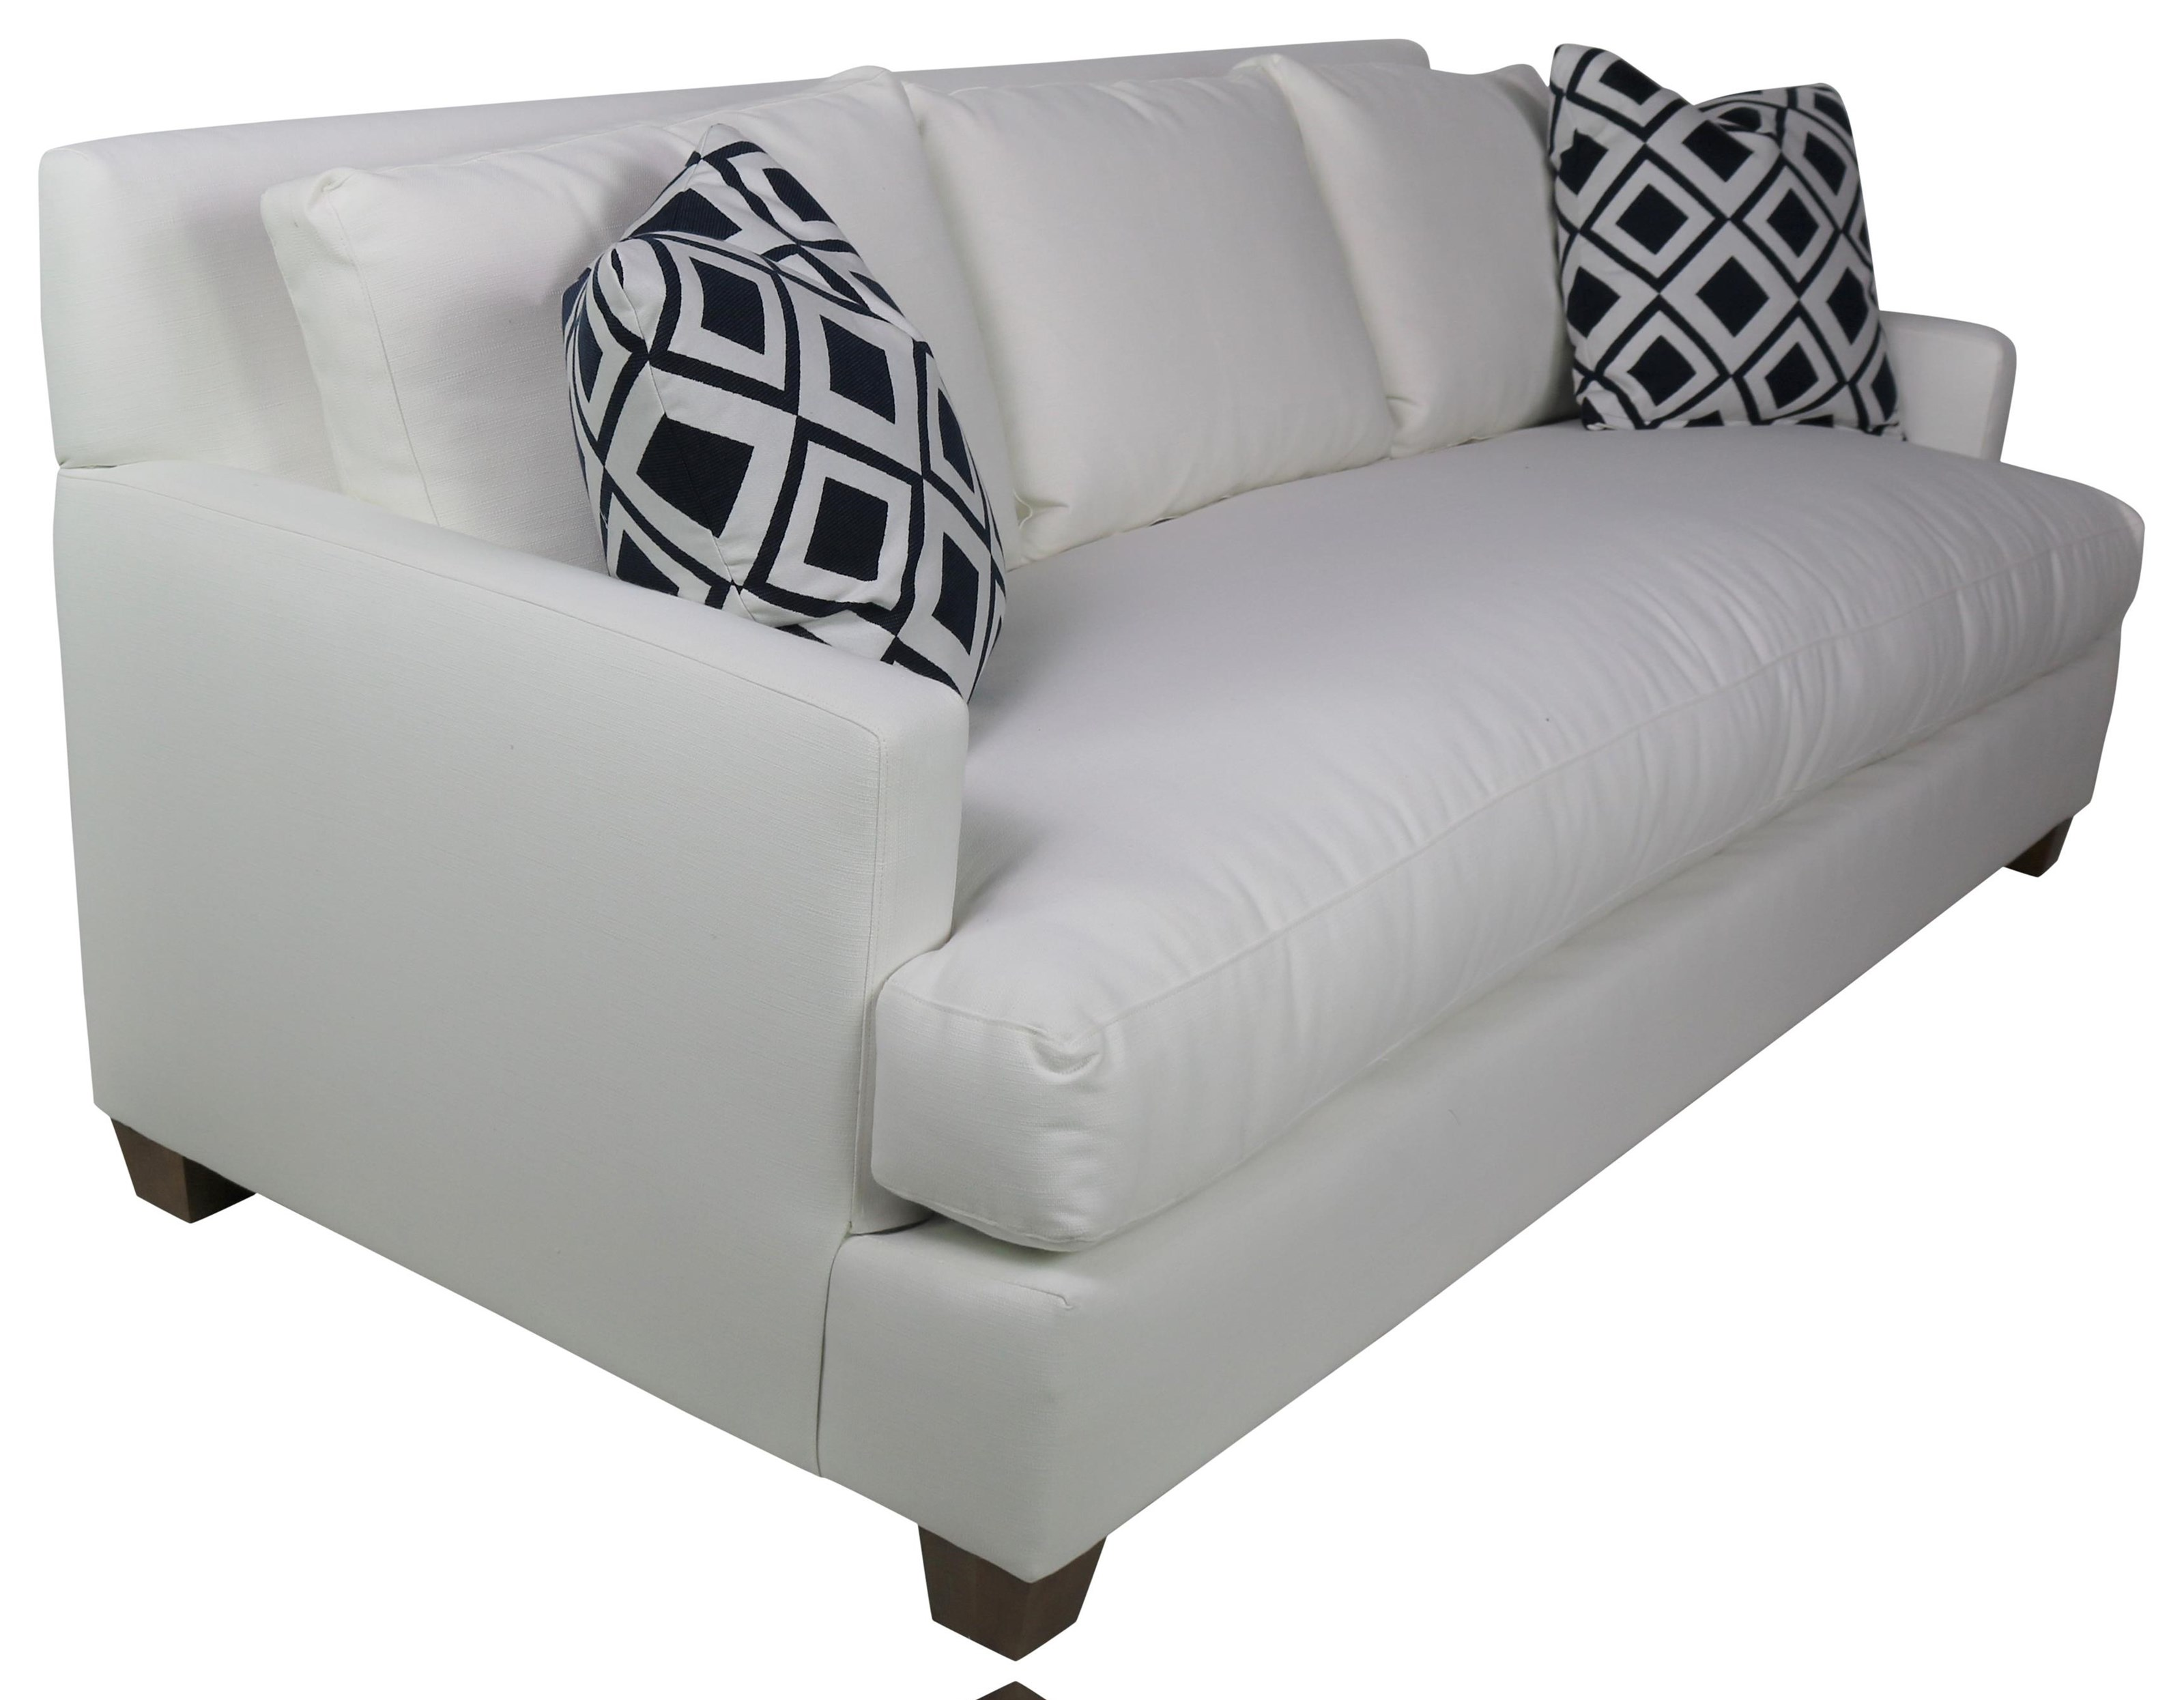 Robin Bruce Laney Transitional 92 Sofa With Bench Seat Sprintz Furniture Sofas